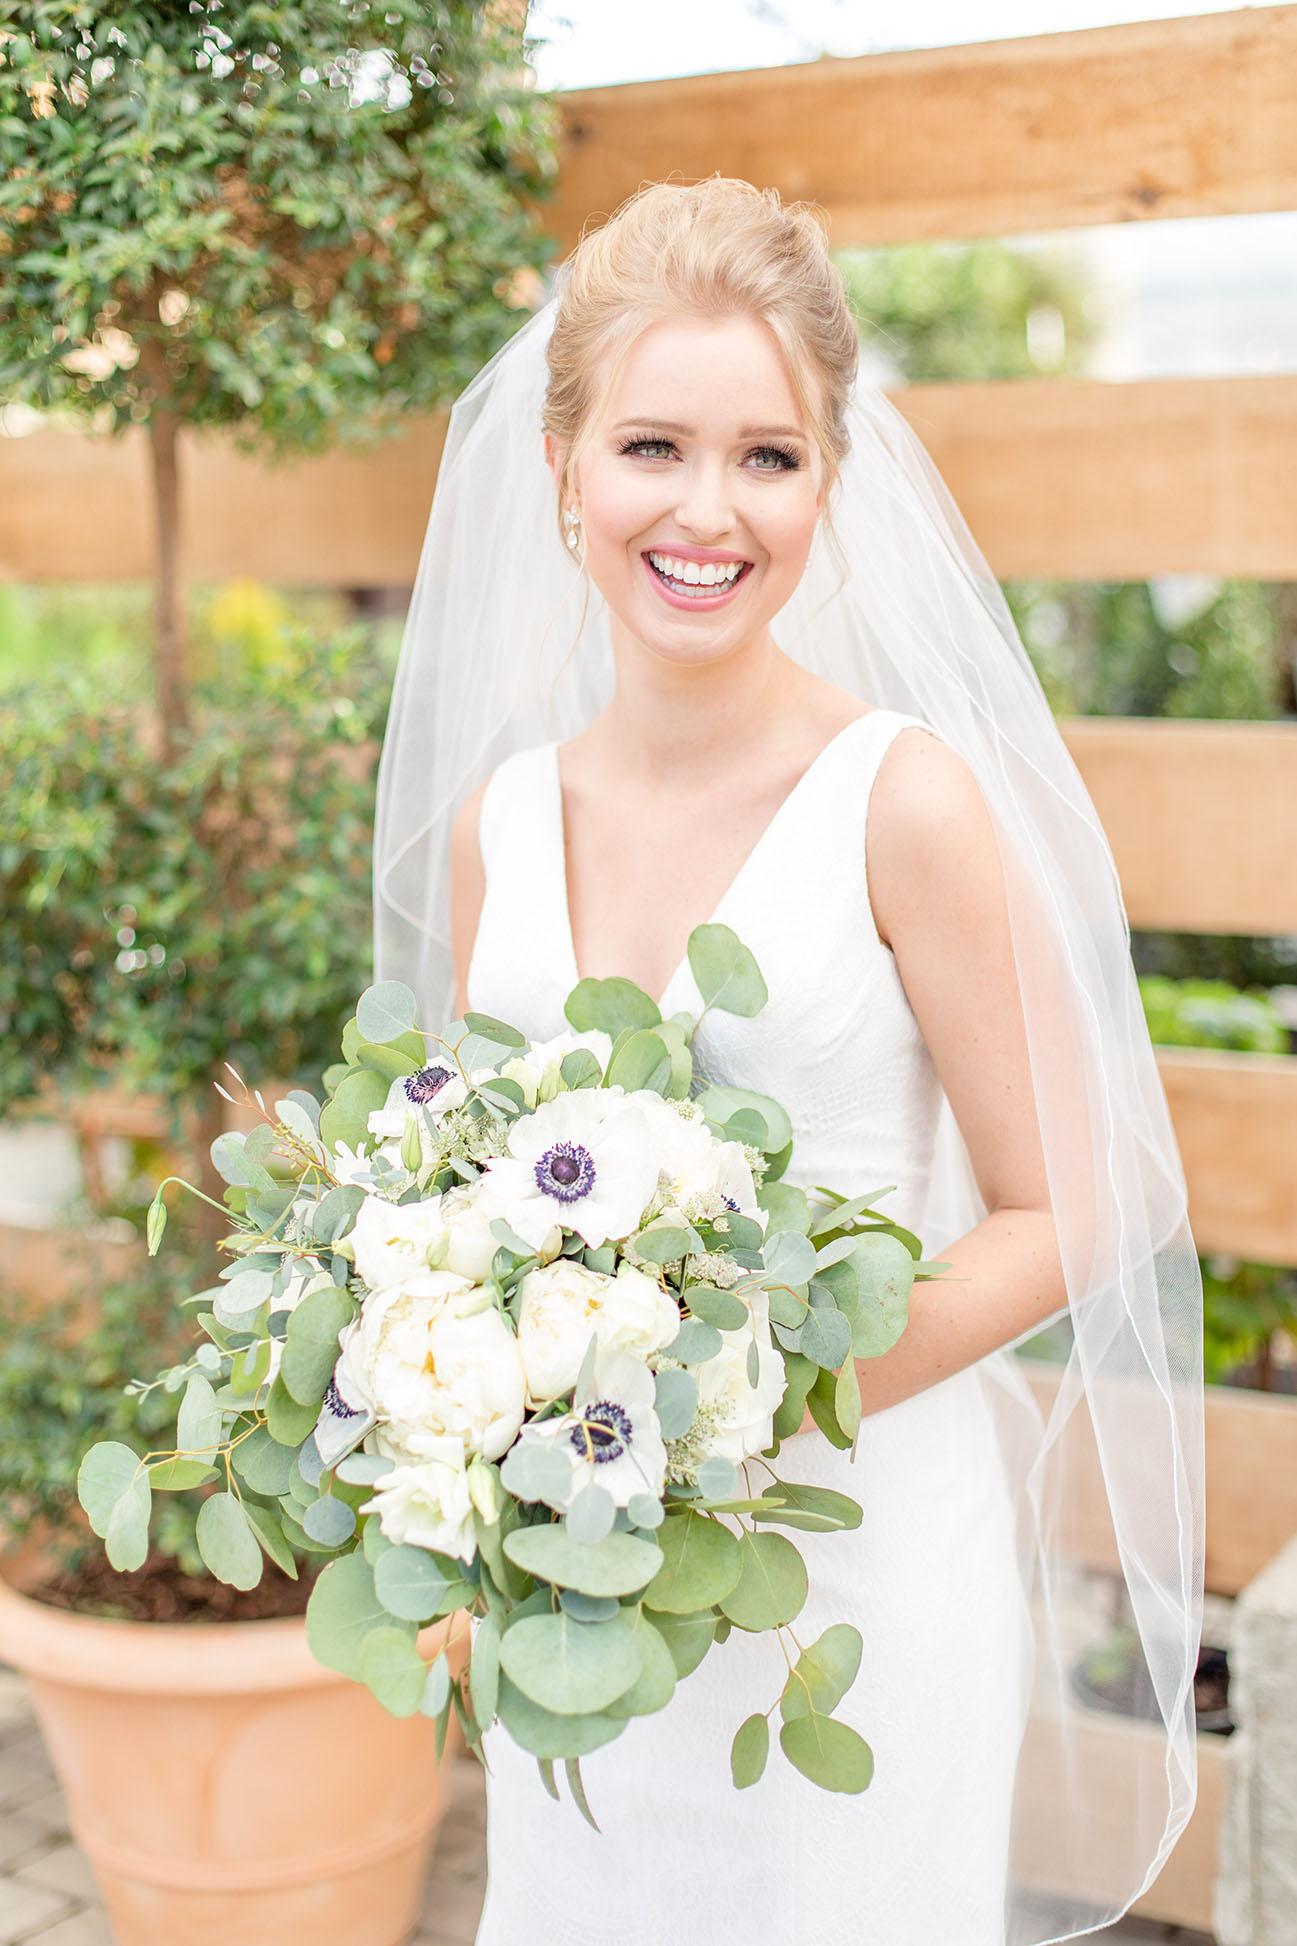 Caroline Holding Simple White Bouquet